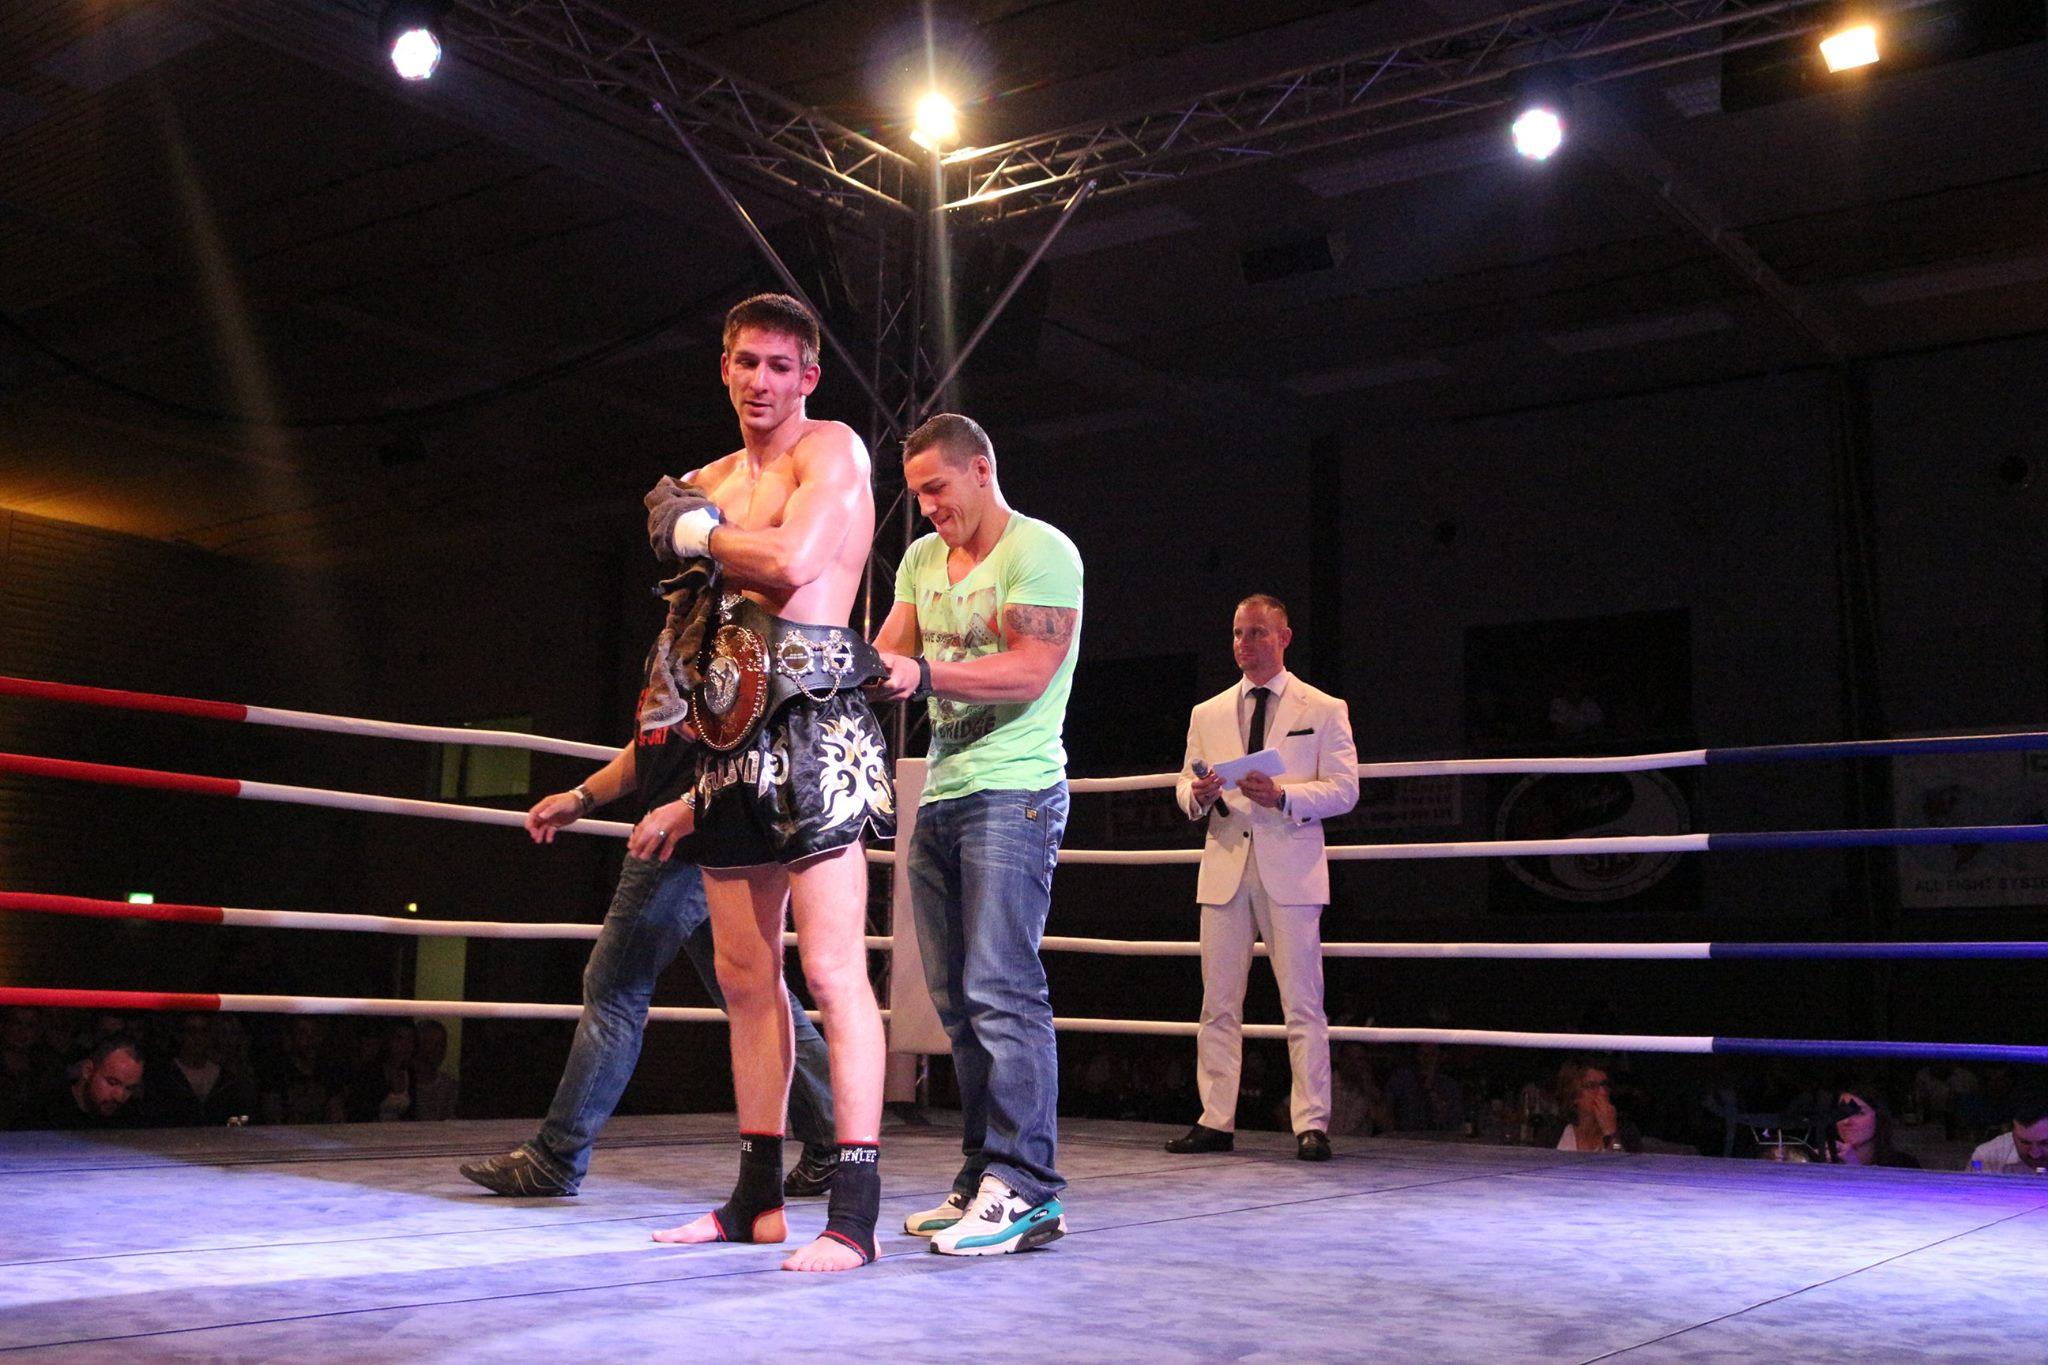 Mirkos Fihgt Night, Schutterwald, Offenburg, Kickboxen, K1, MMA-12